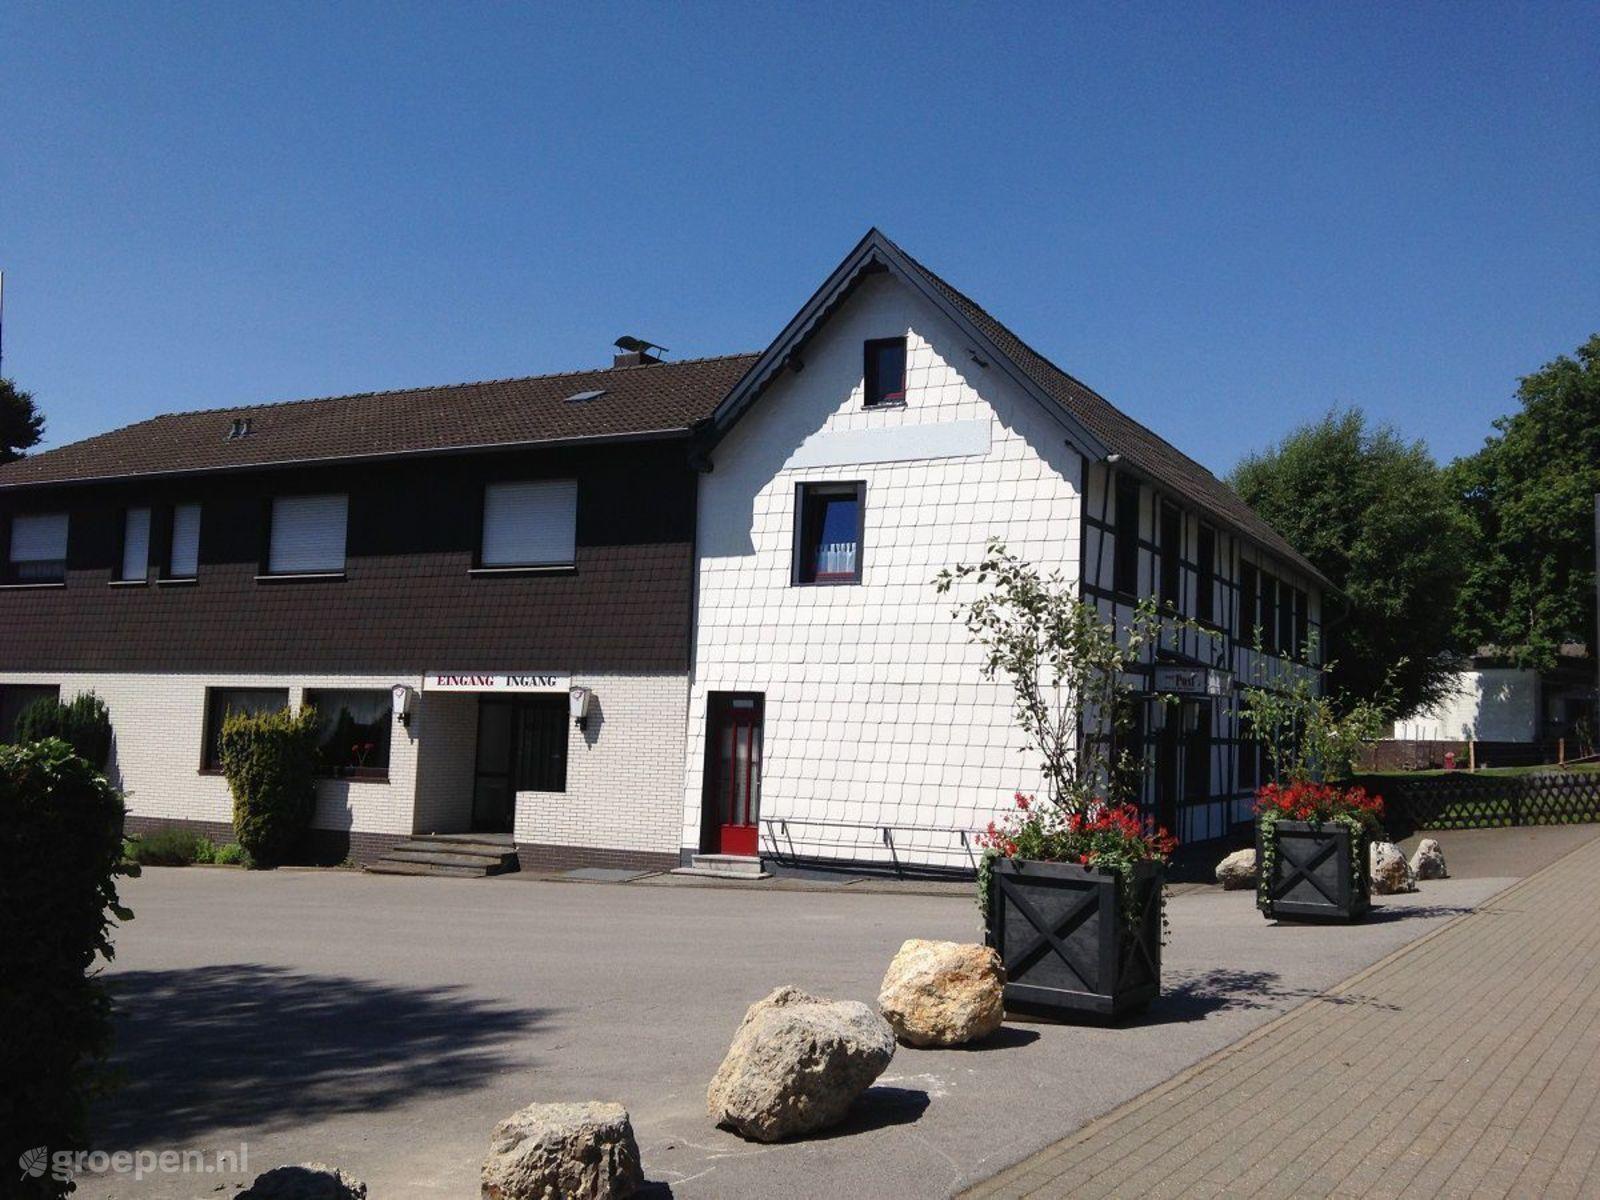 Monschau-Hofen